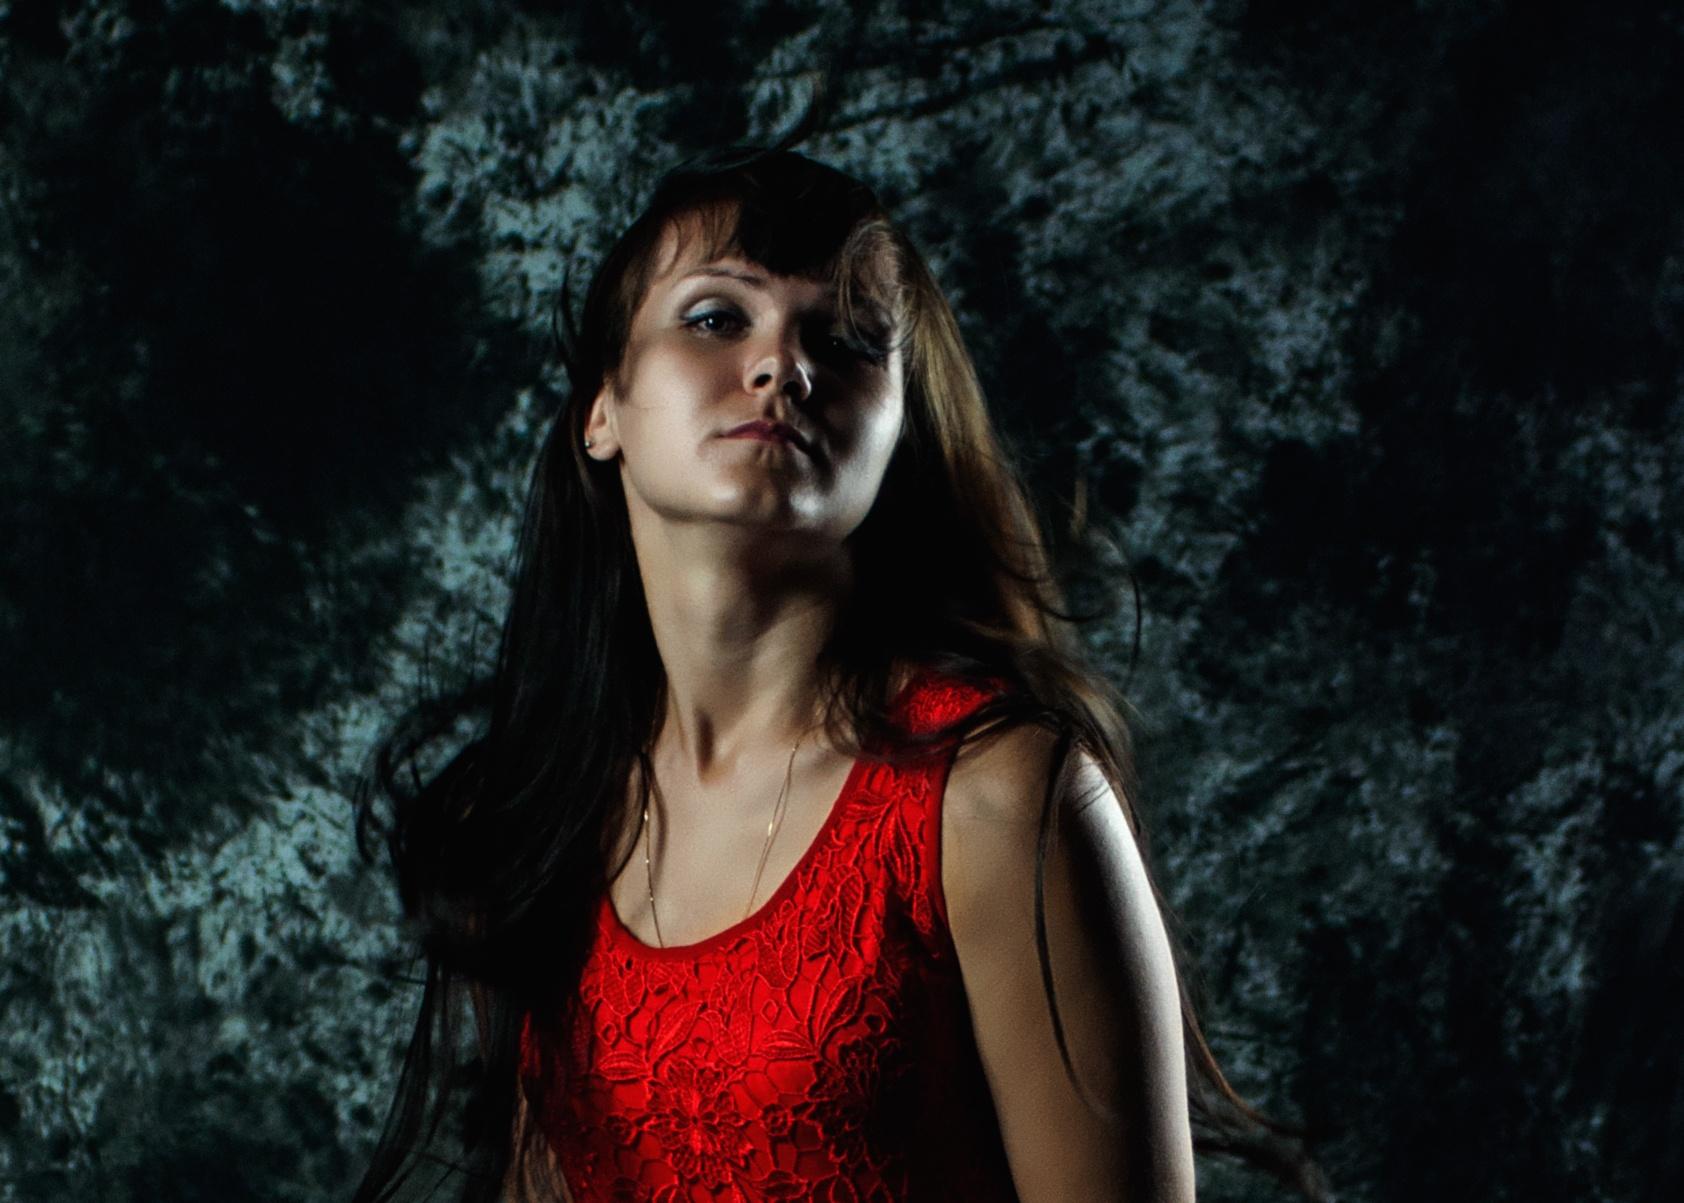 Larissa by Georgie Dimitrov